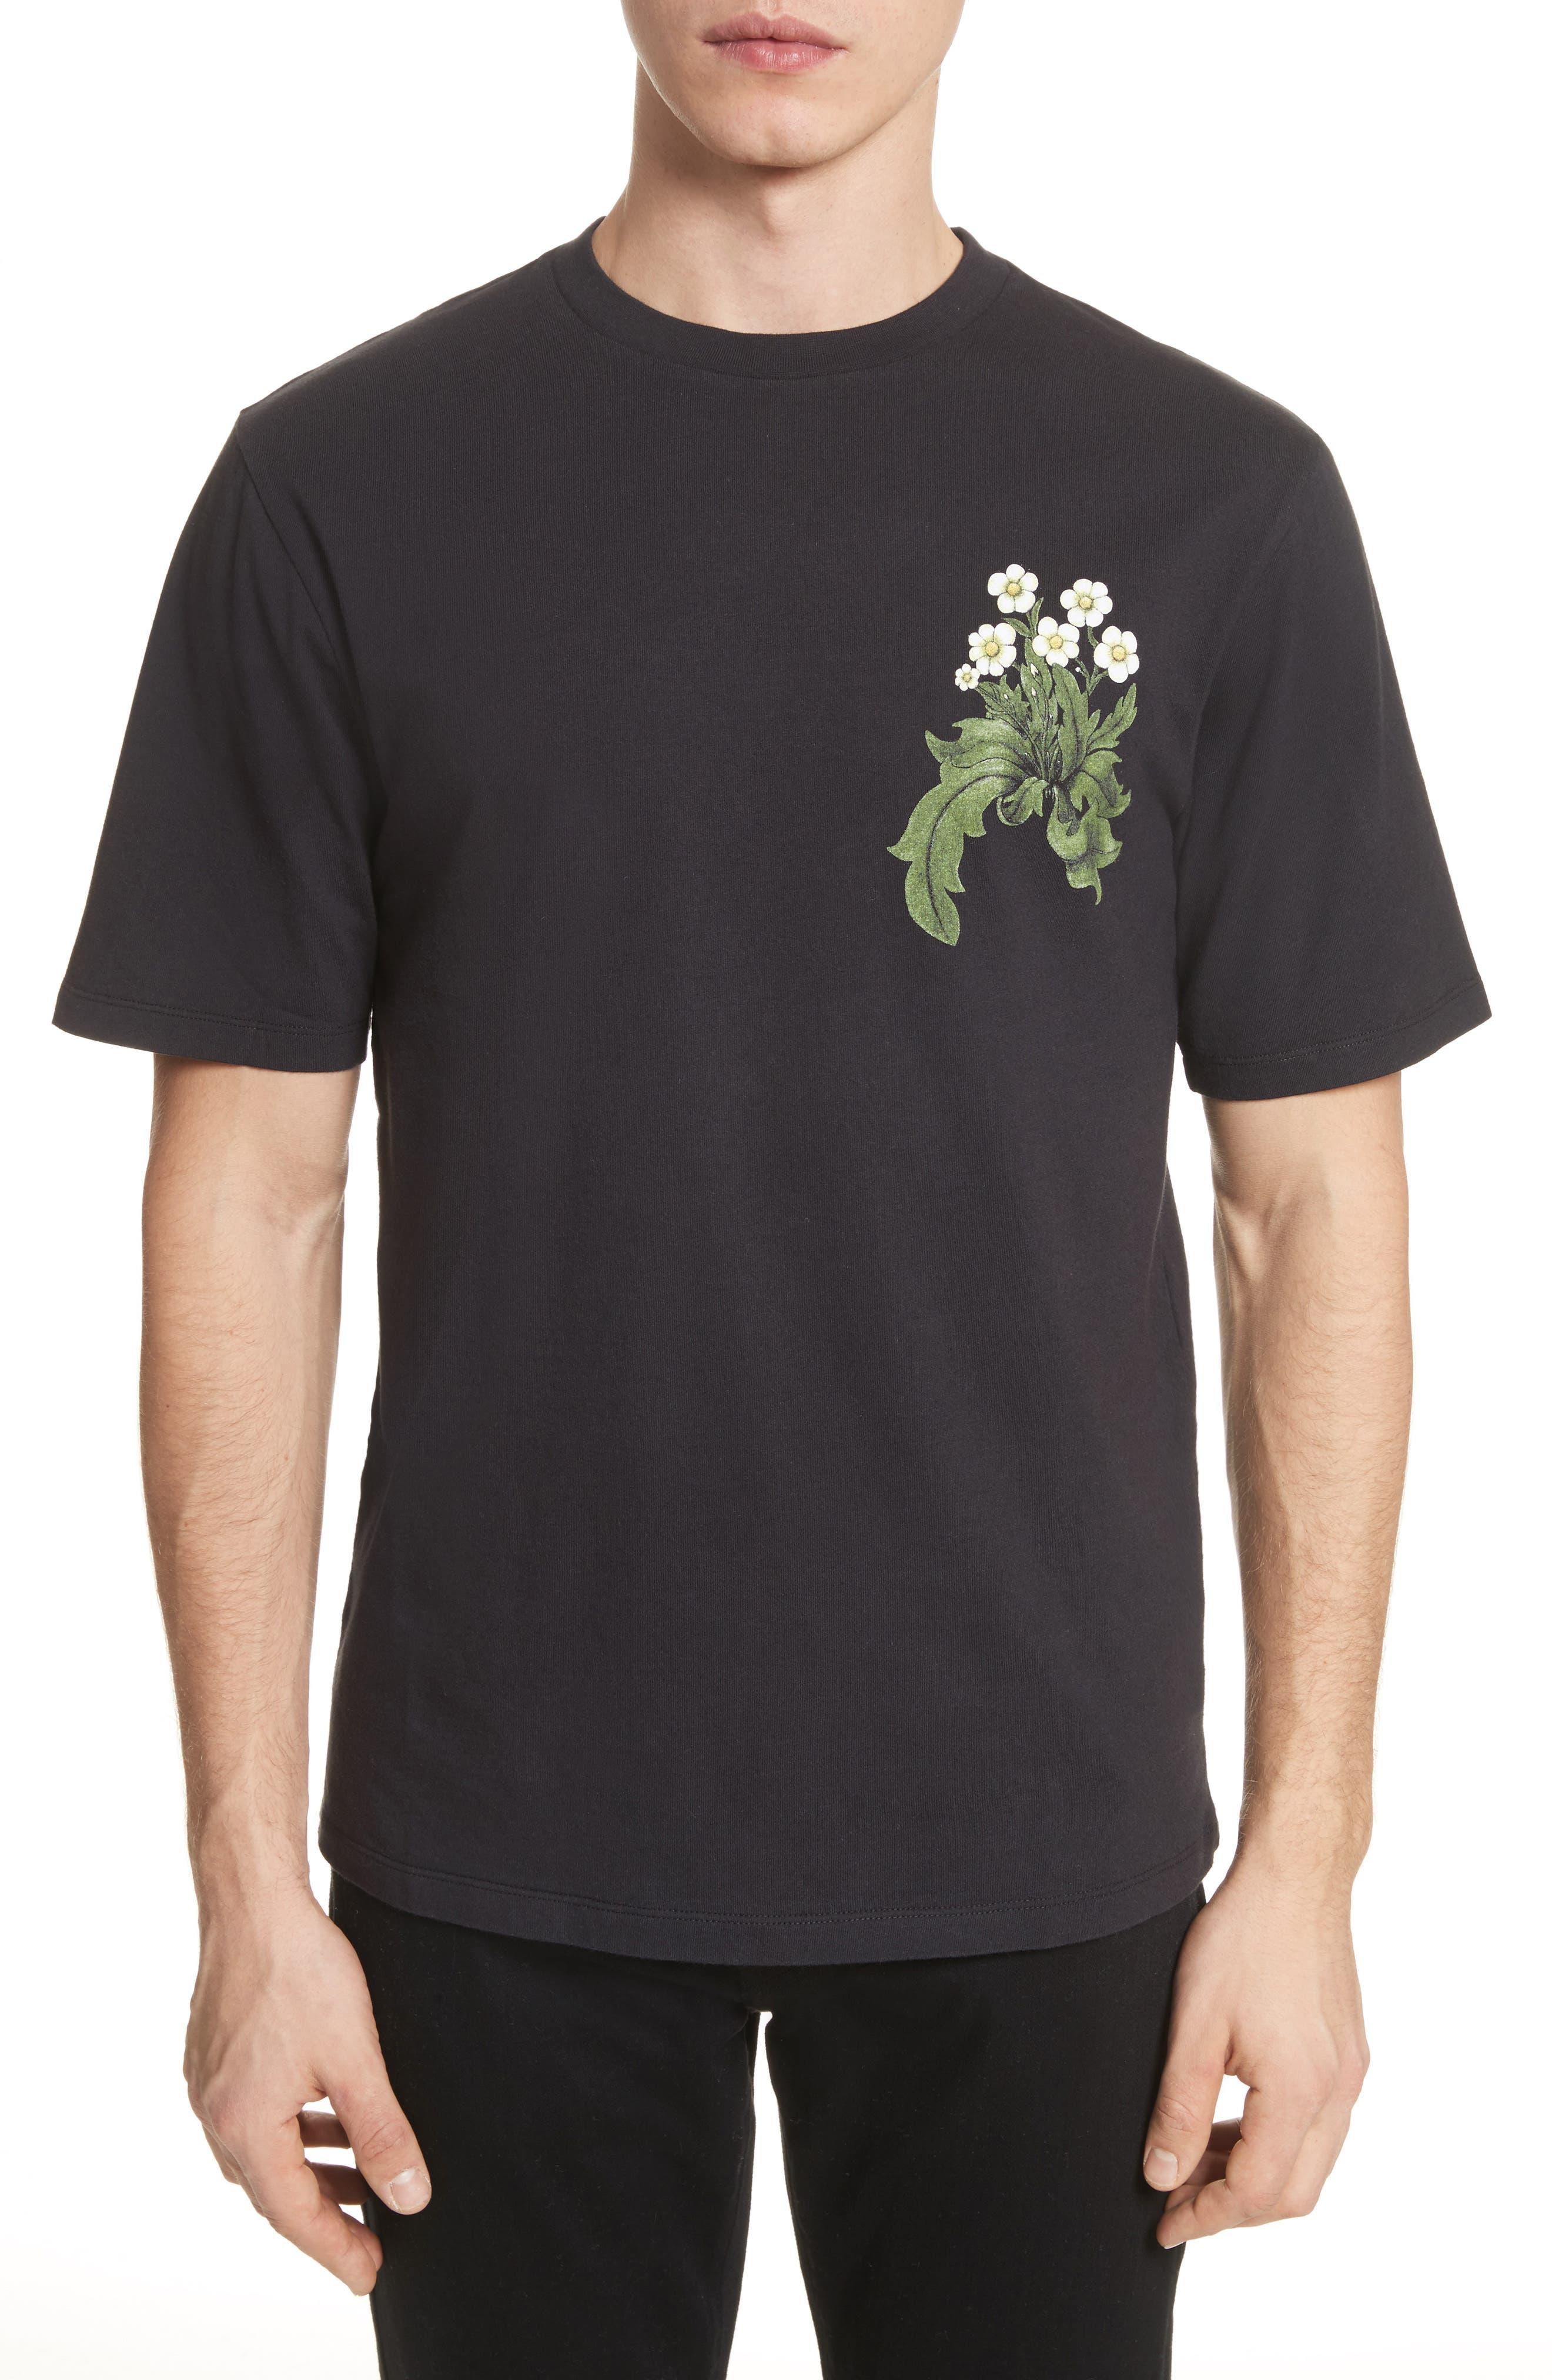 Loewe Loewe & Co. Graphic T-Shirt